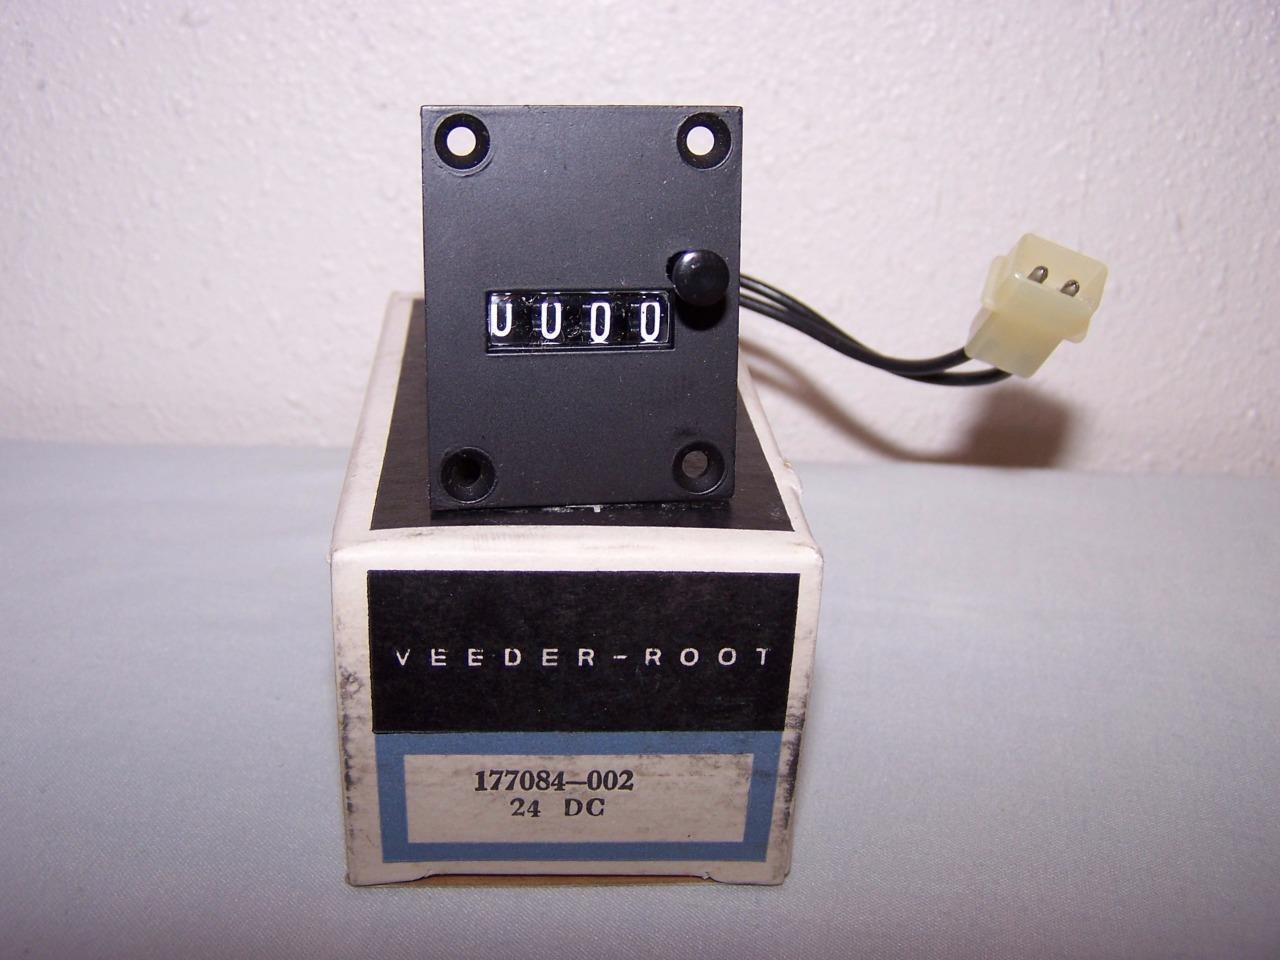 VEEDER ROOT 177084-002  MECHANICAL HOUR METER REGISTER NEW IN BOX